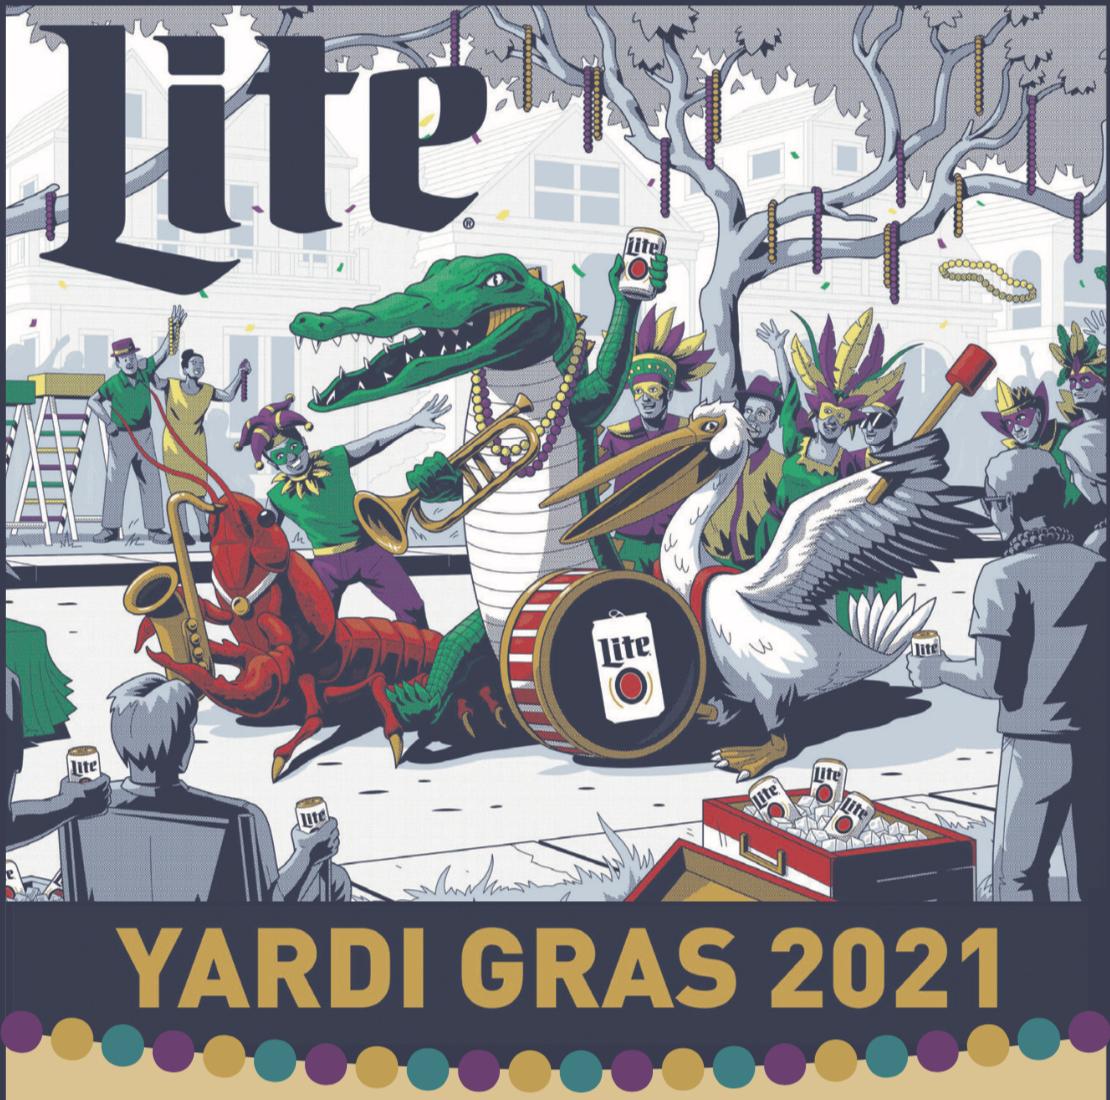 Yardi Gras 2021